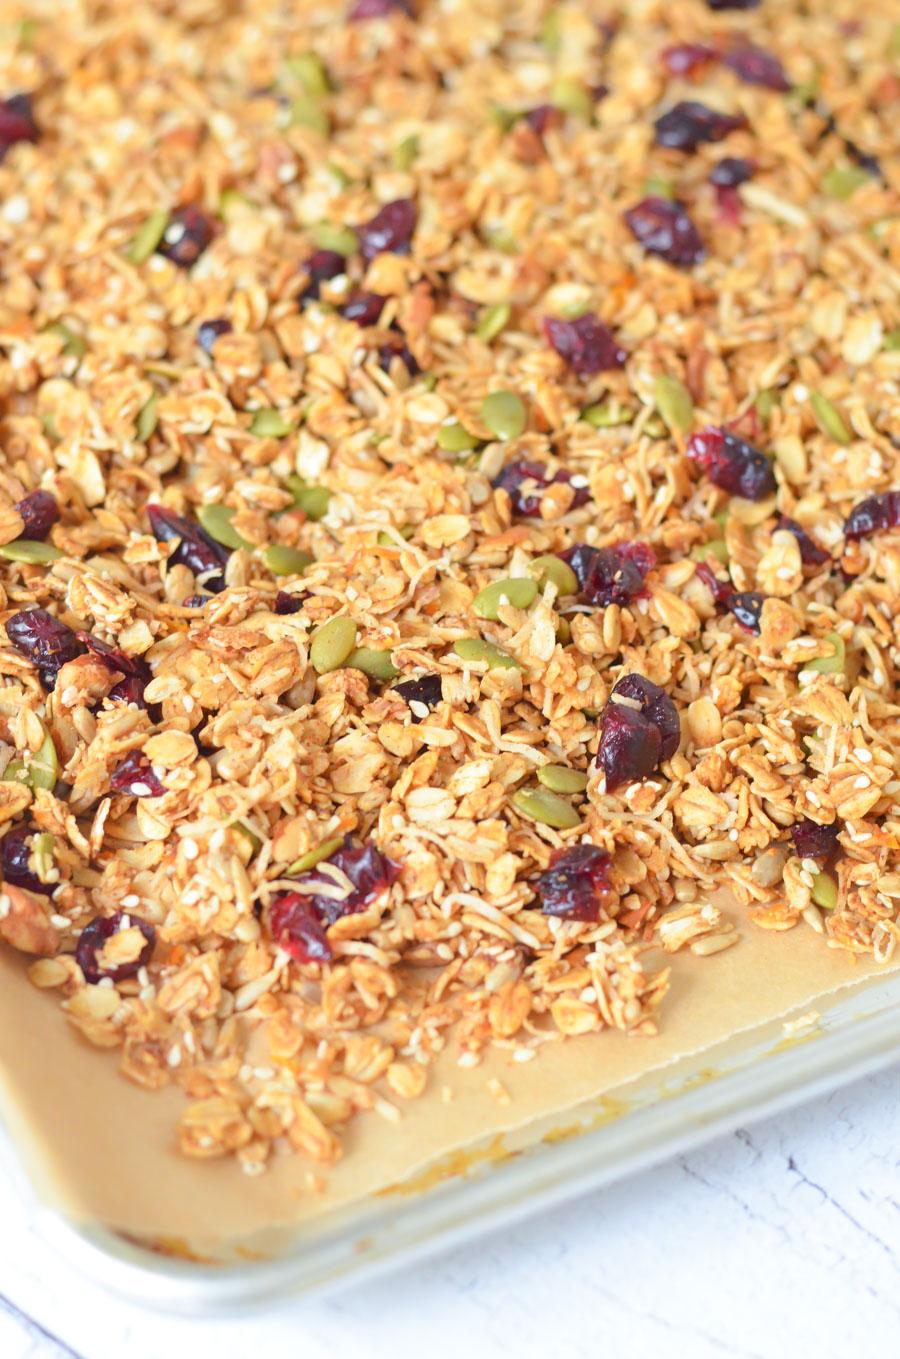 Coconut Sesame Seed Granola Recipe